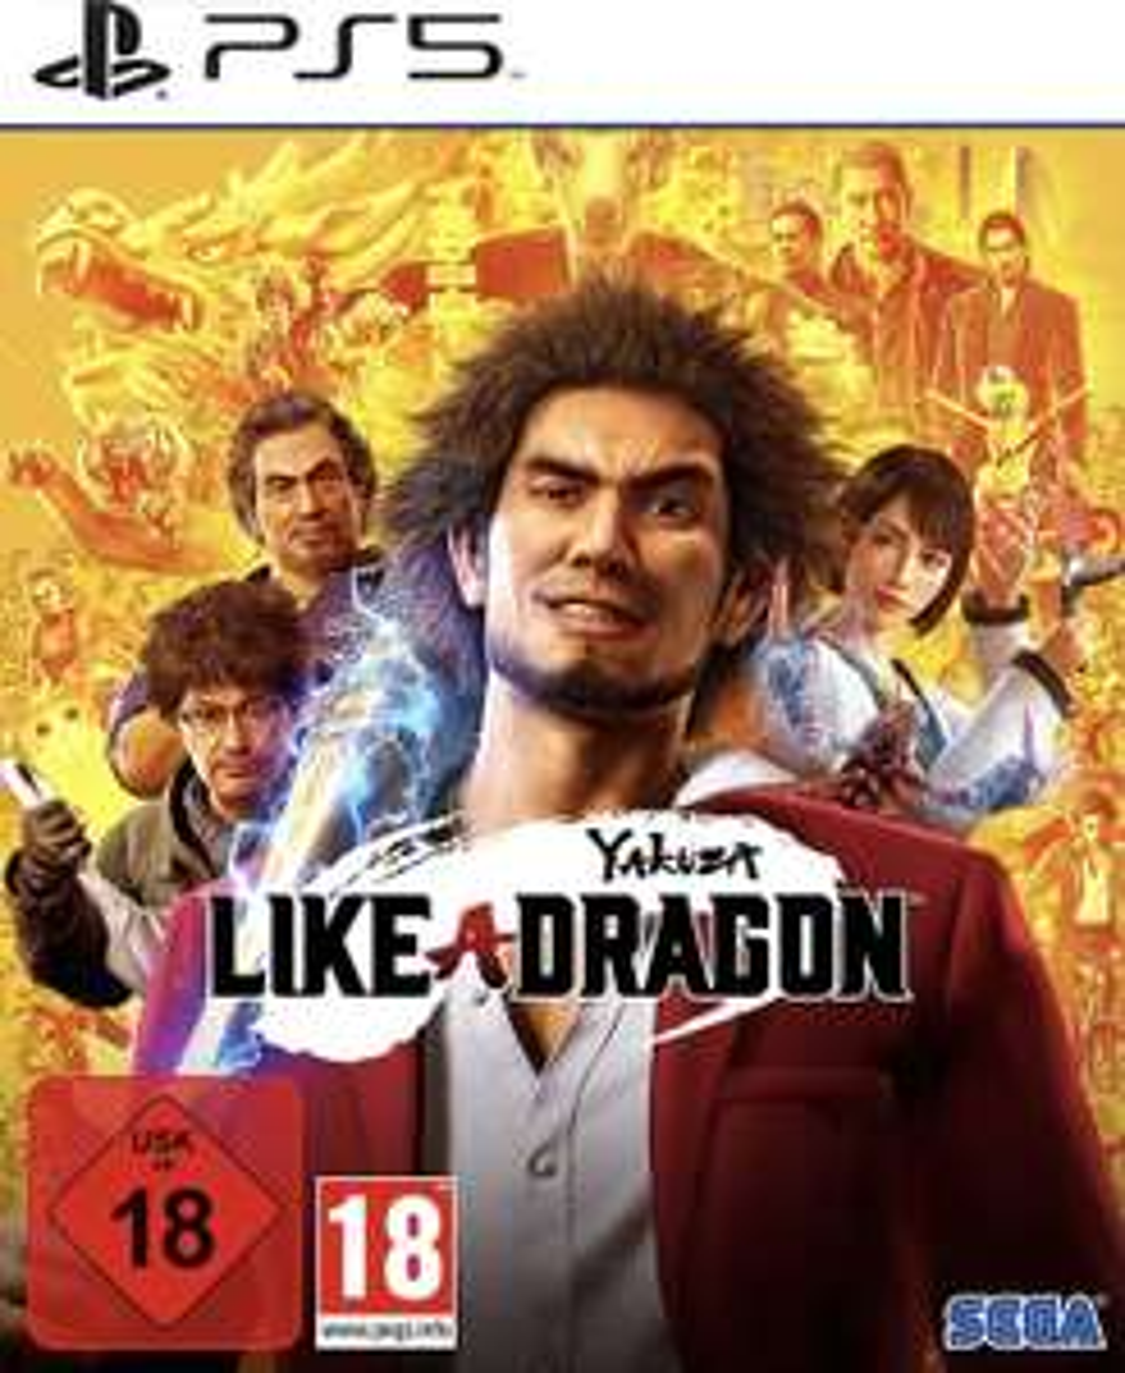 Yakuza 7: Like a Dragon (Playstation 5) Primeday